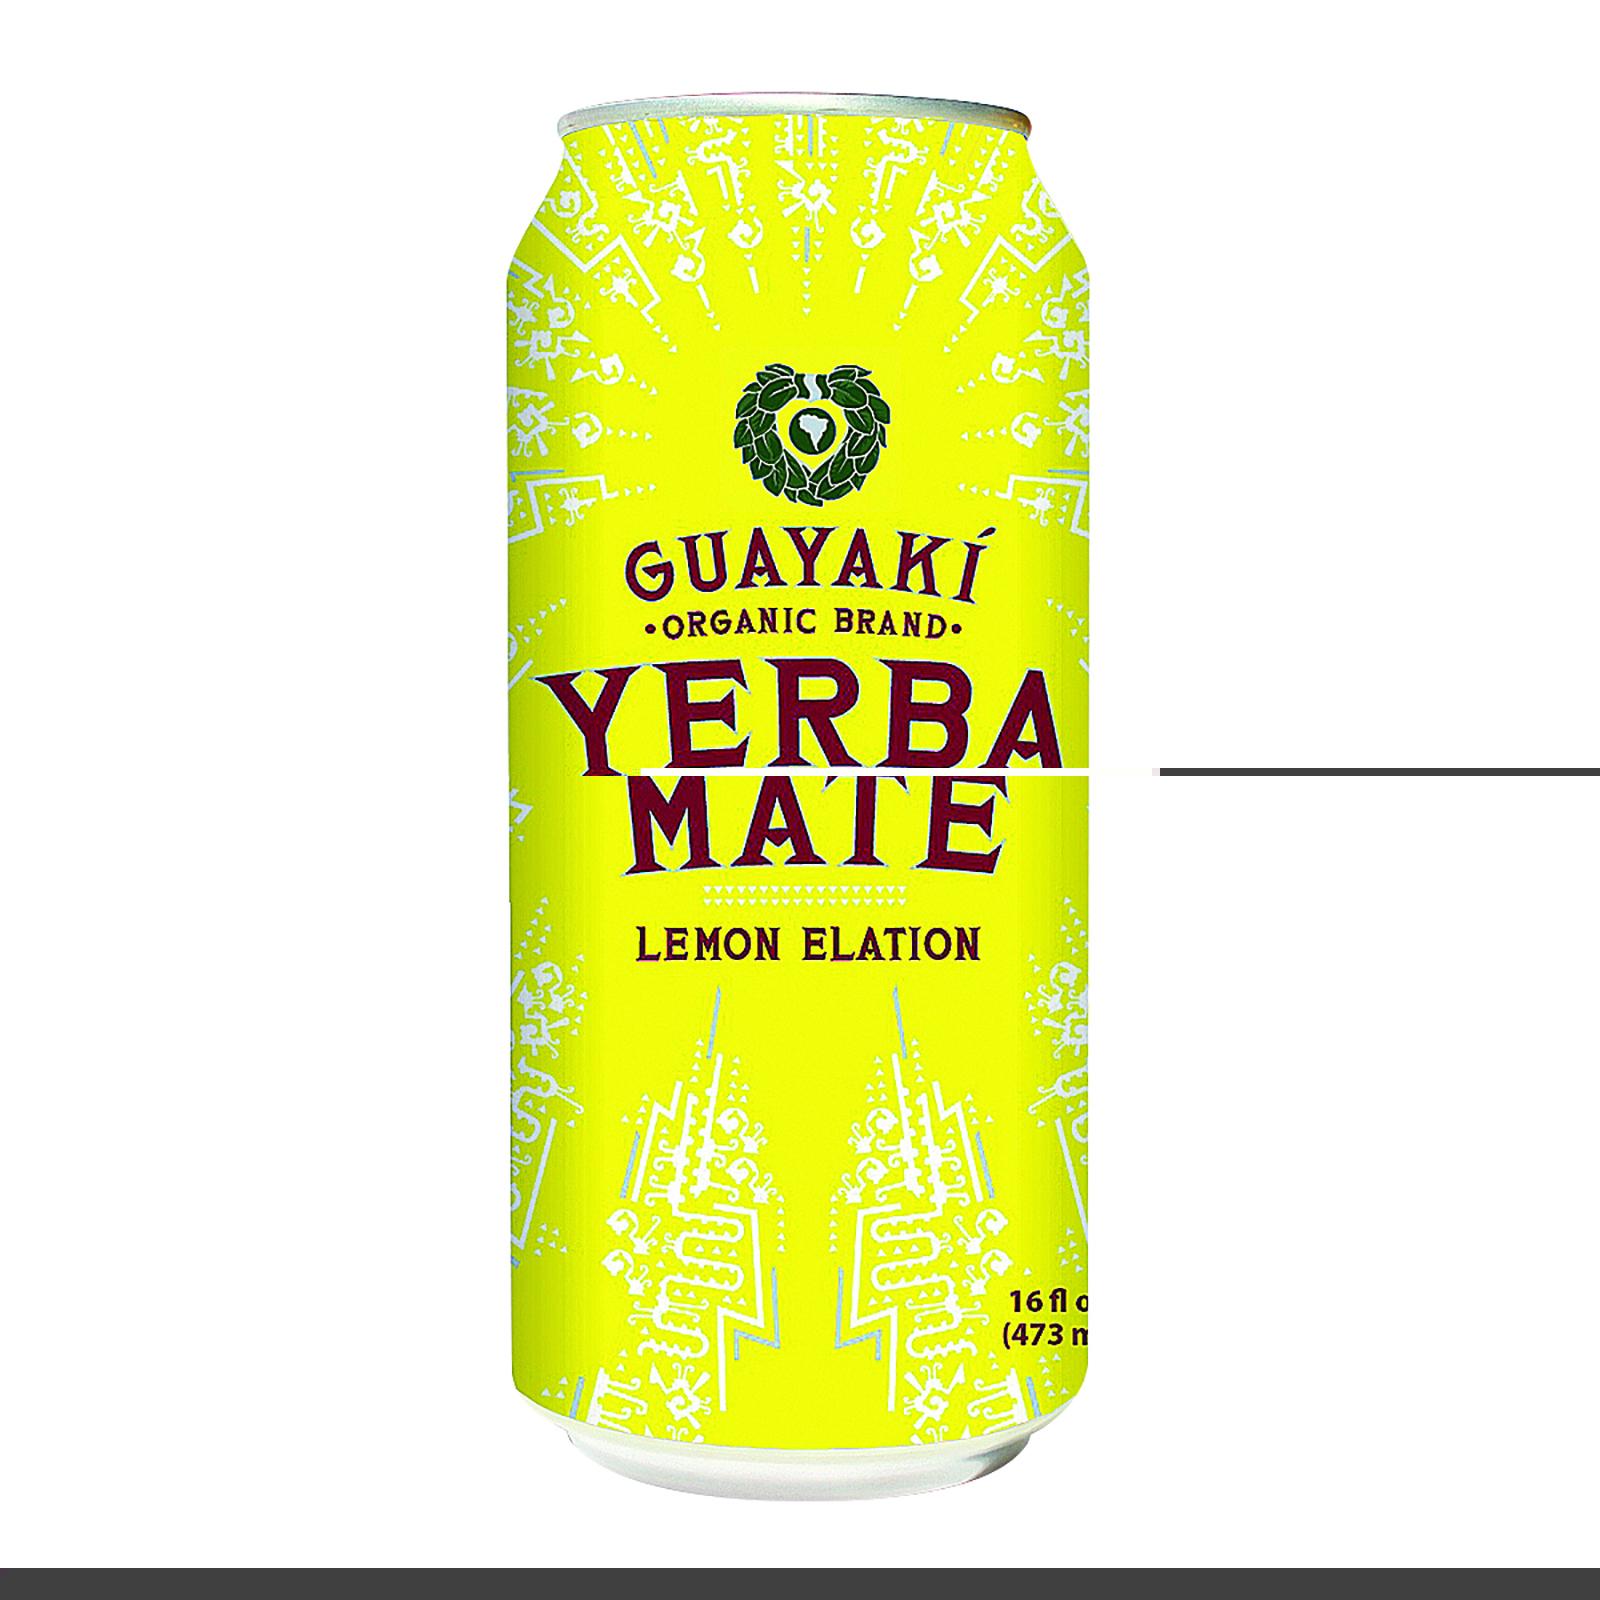 Guayaki Yerba Mate - Lemon Elation - Case of 12 - 15.5 Fl oz.